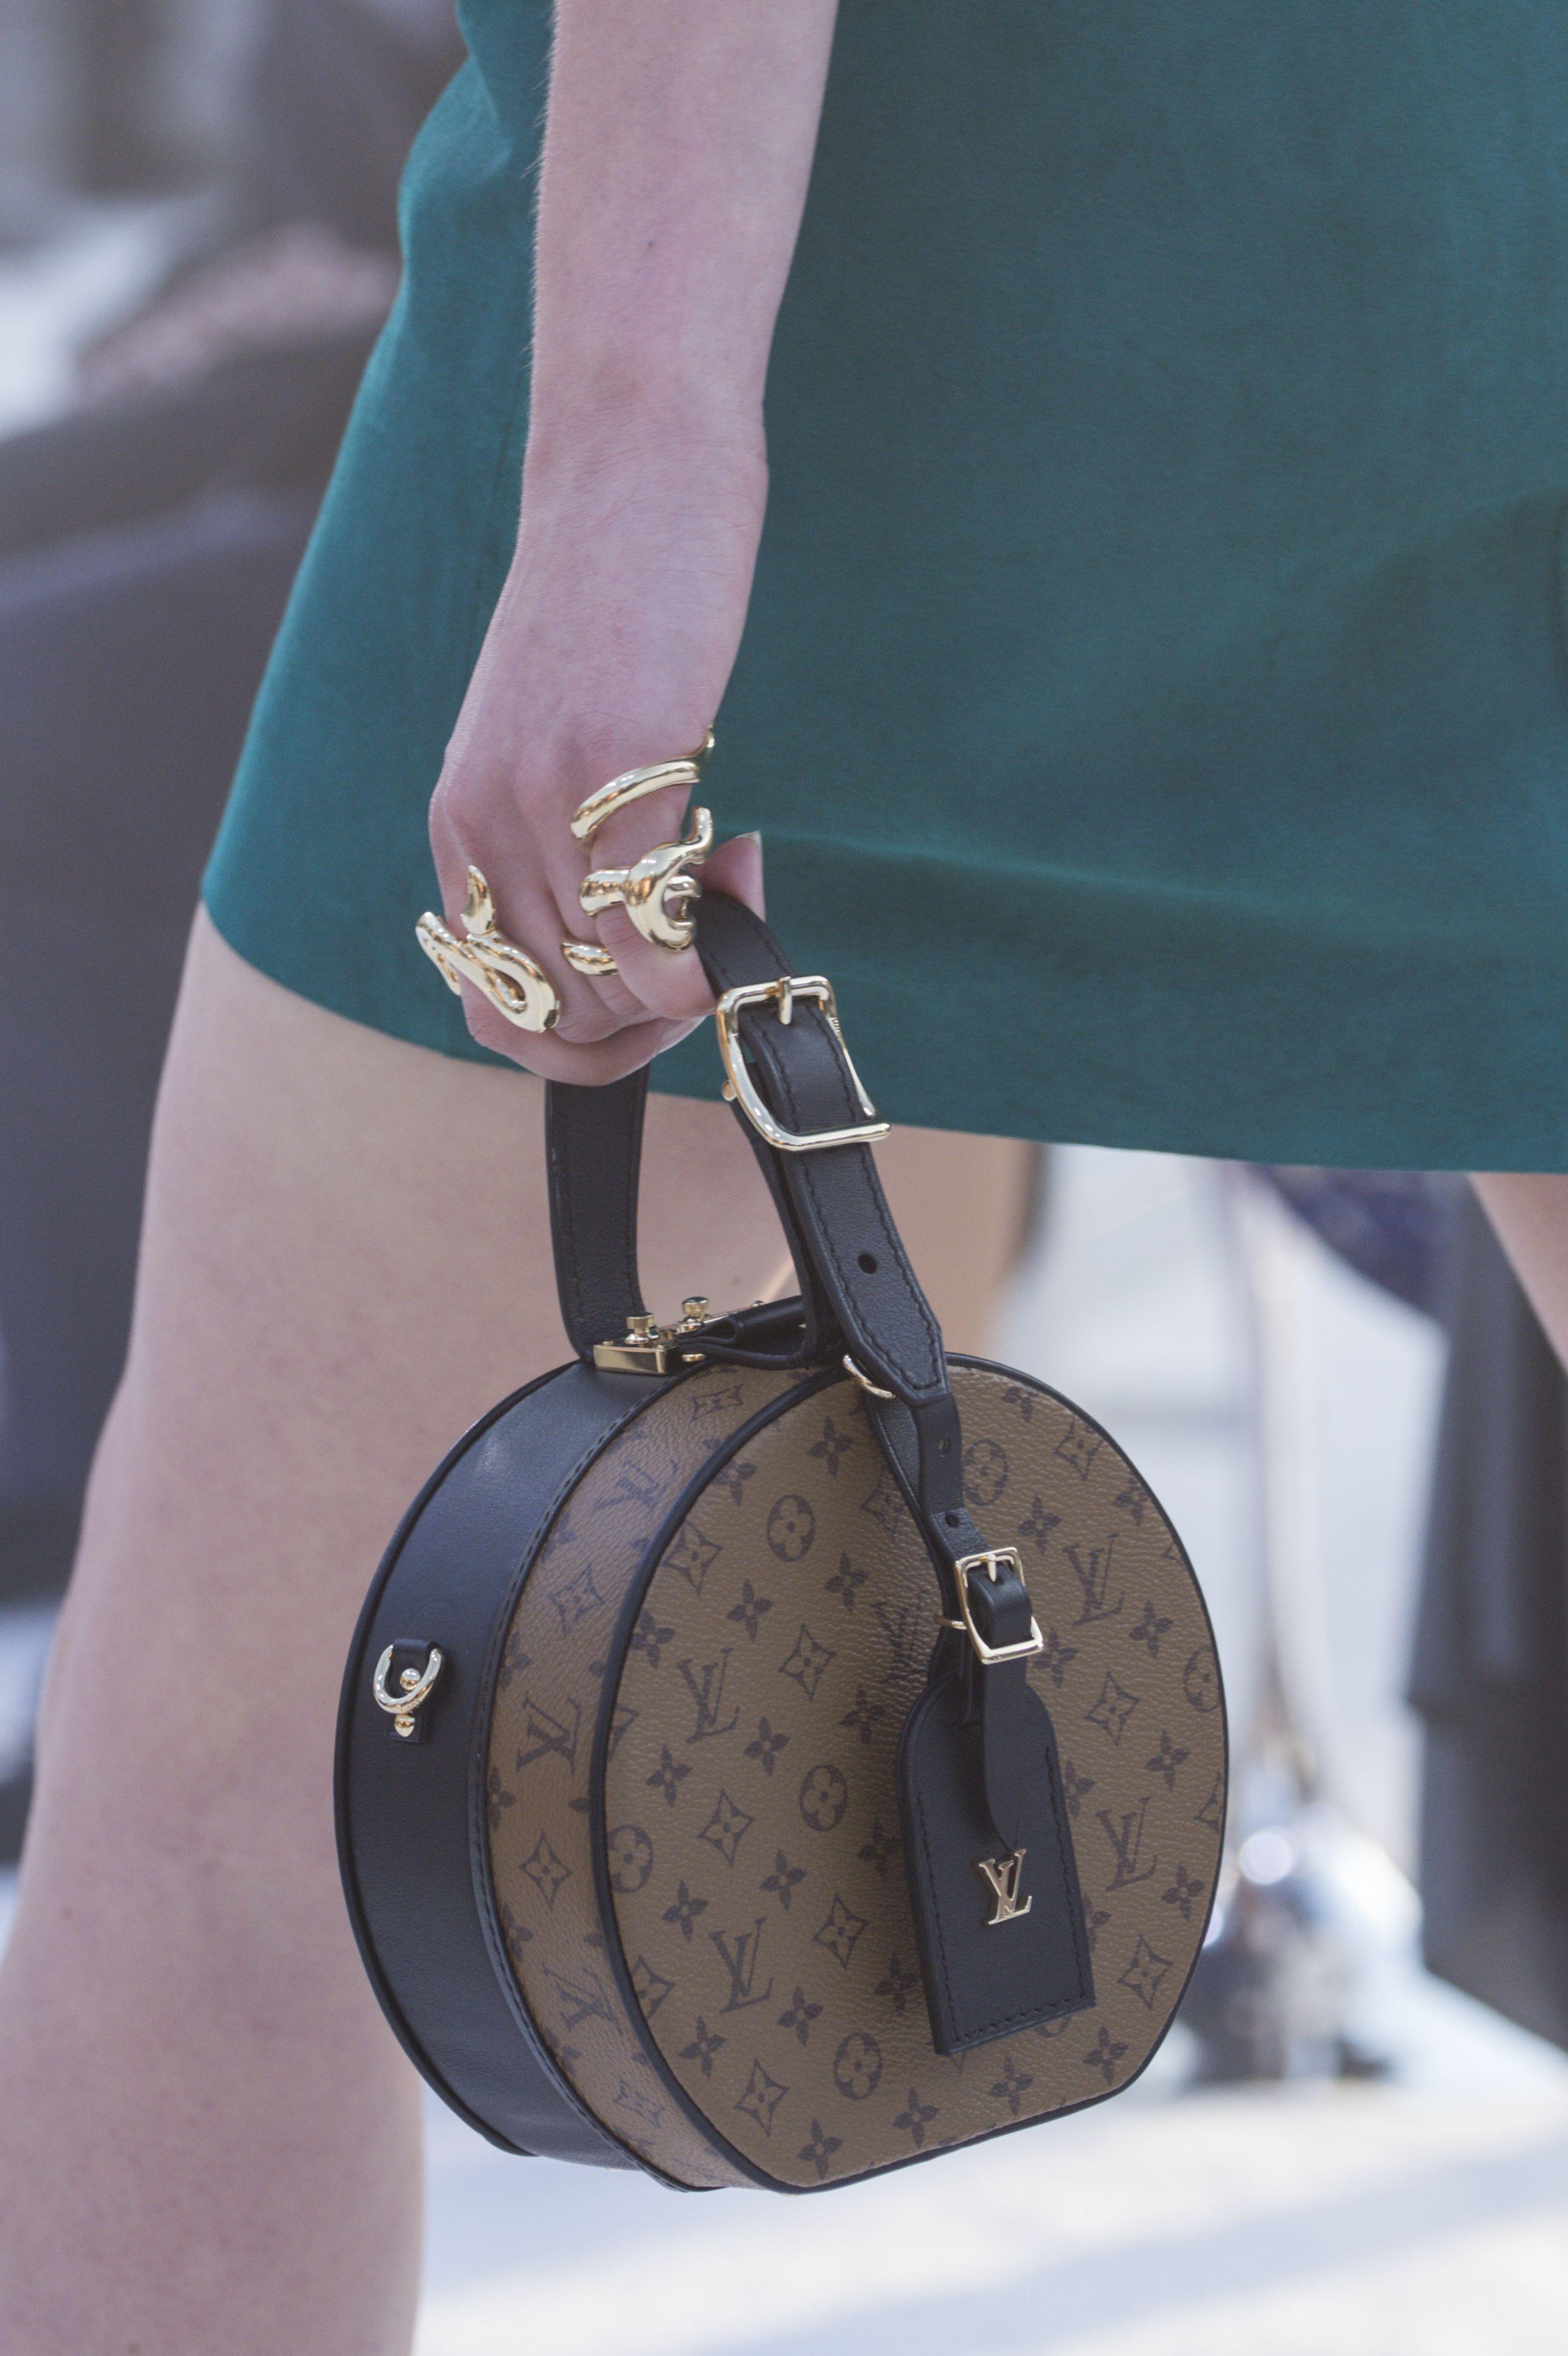 A bag from the Louis Vuitton Cruise 2018 Fashion Show by Nicolas  Ghesquière 7ed55ad91d1f3